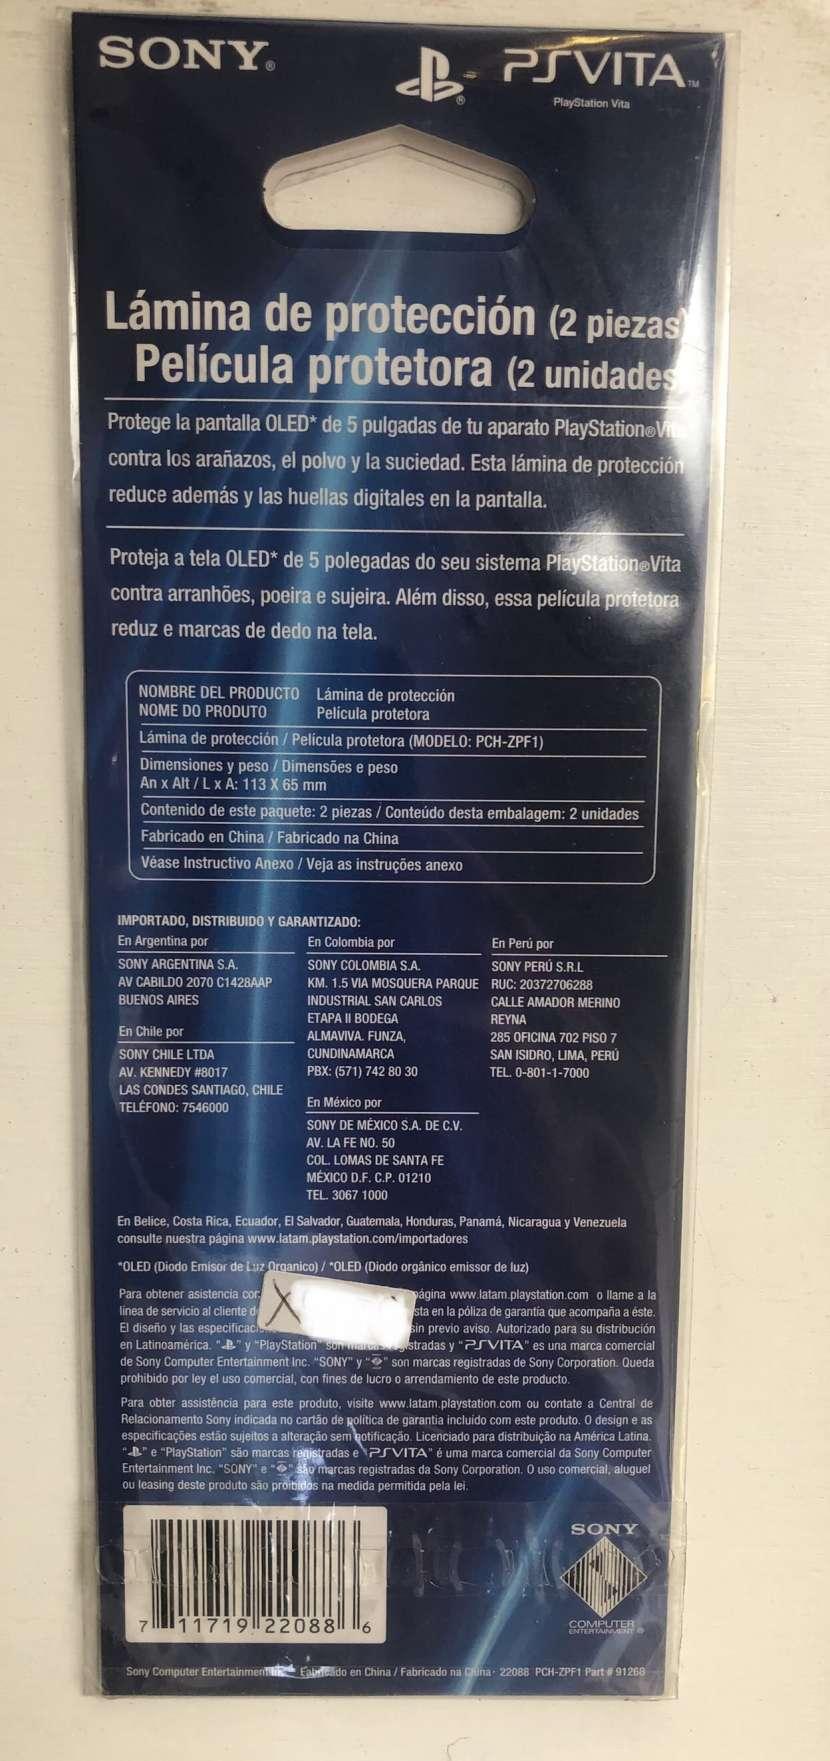 Lámina de protección PS-Vita - 1